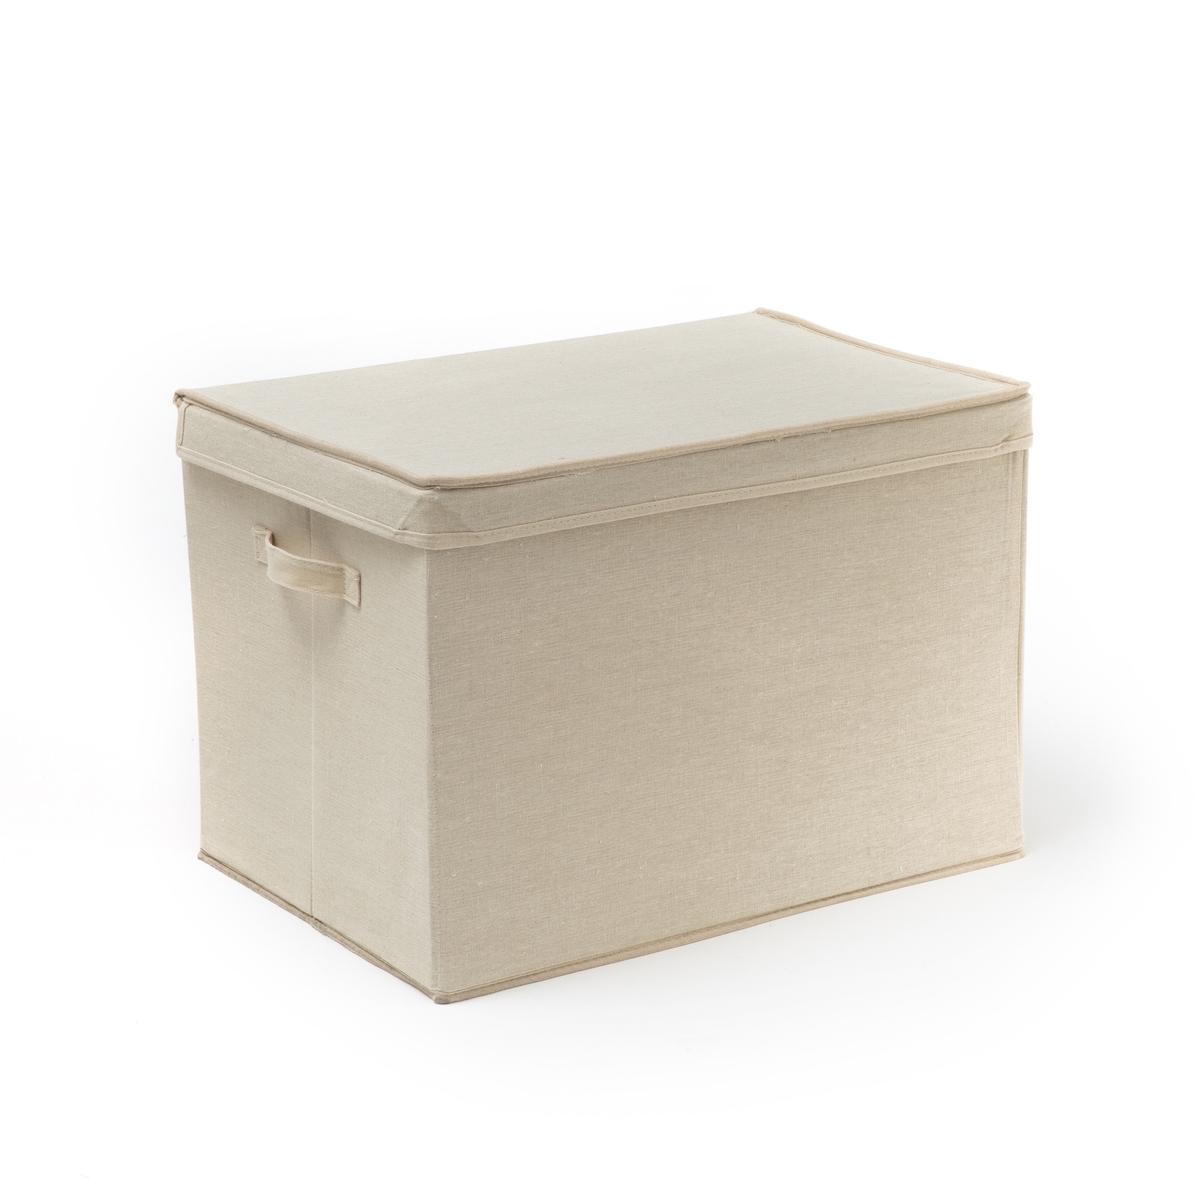 Коробка La Redoute Из льна размер M ORFA единый размер бежевый наволочка la redoute flooch 50 x 30 см бежевый